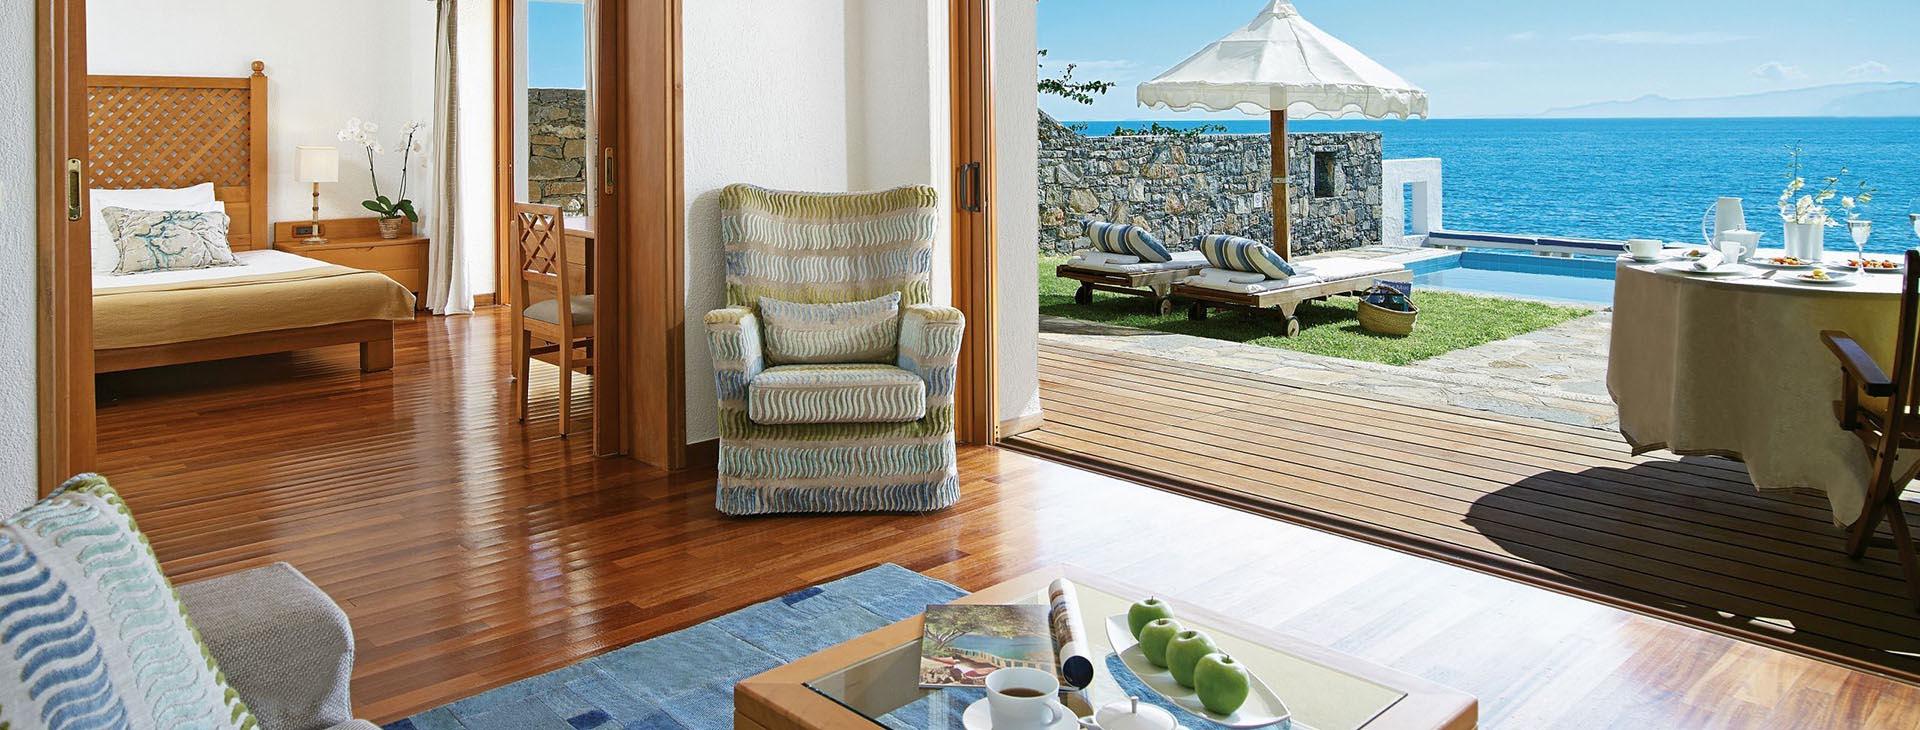 Elounda Peninsula All Suite Hotel - Presidential Suites